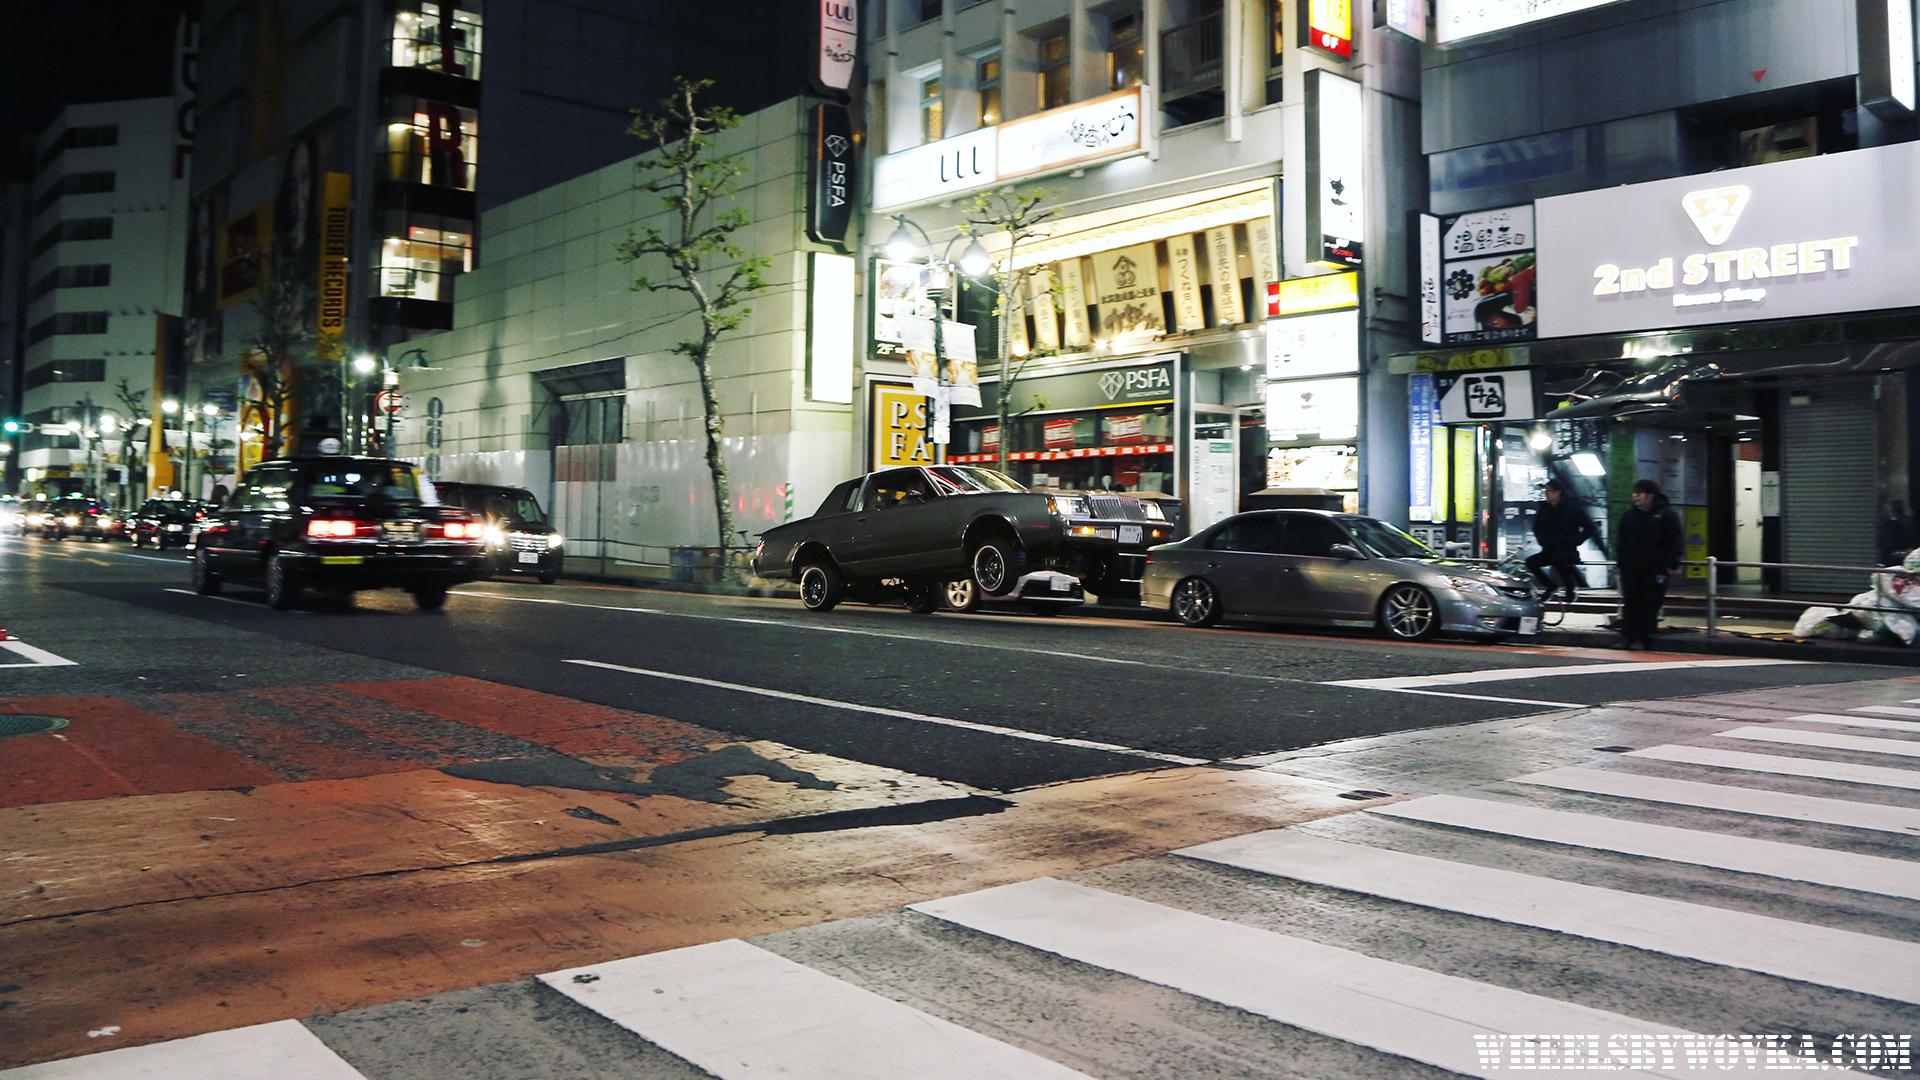 shibuya-japan-tokyo-lowrider-cruise-night-41